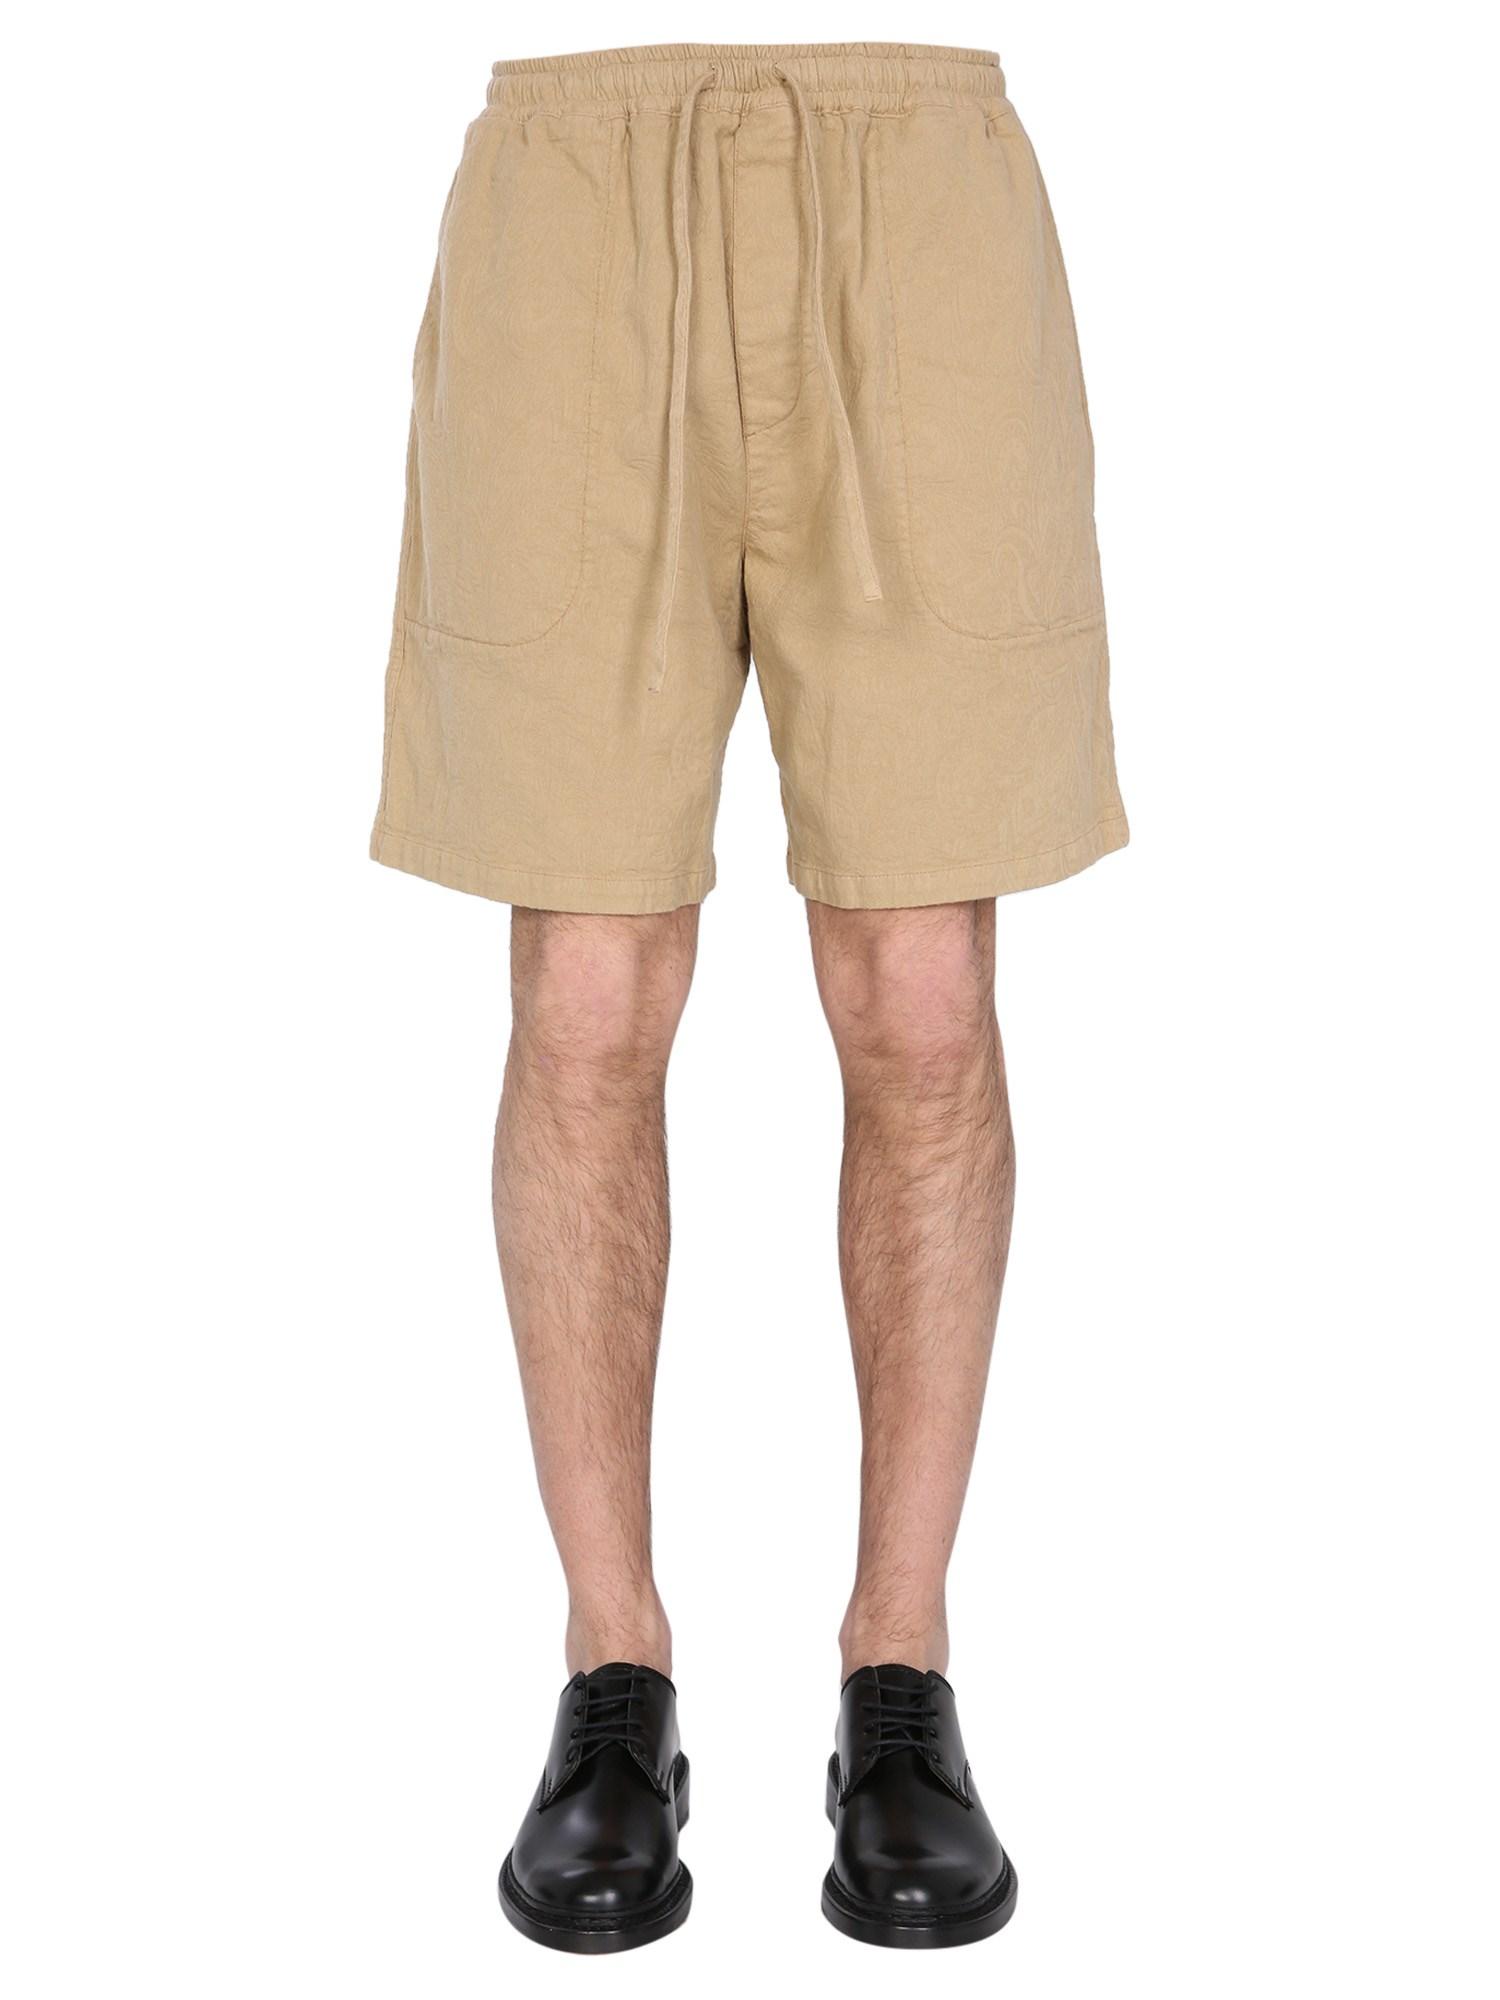 Ymc paisley jacquard shorts - ymc - Modalova